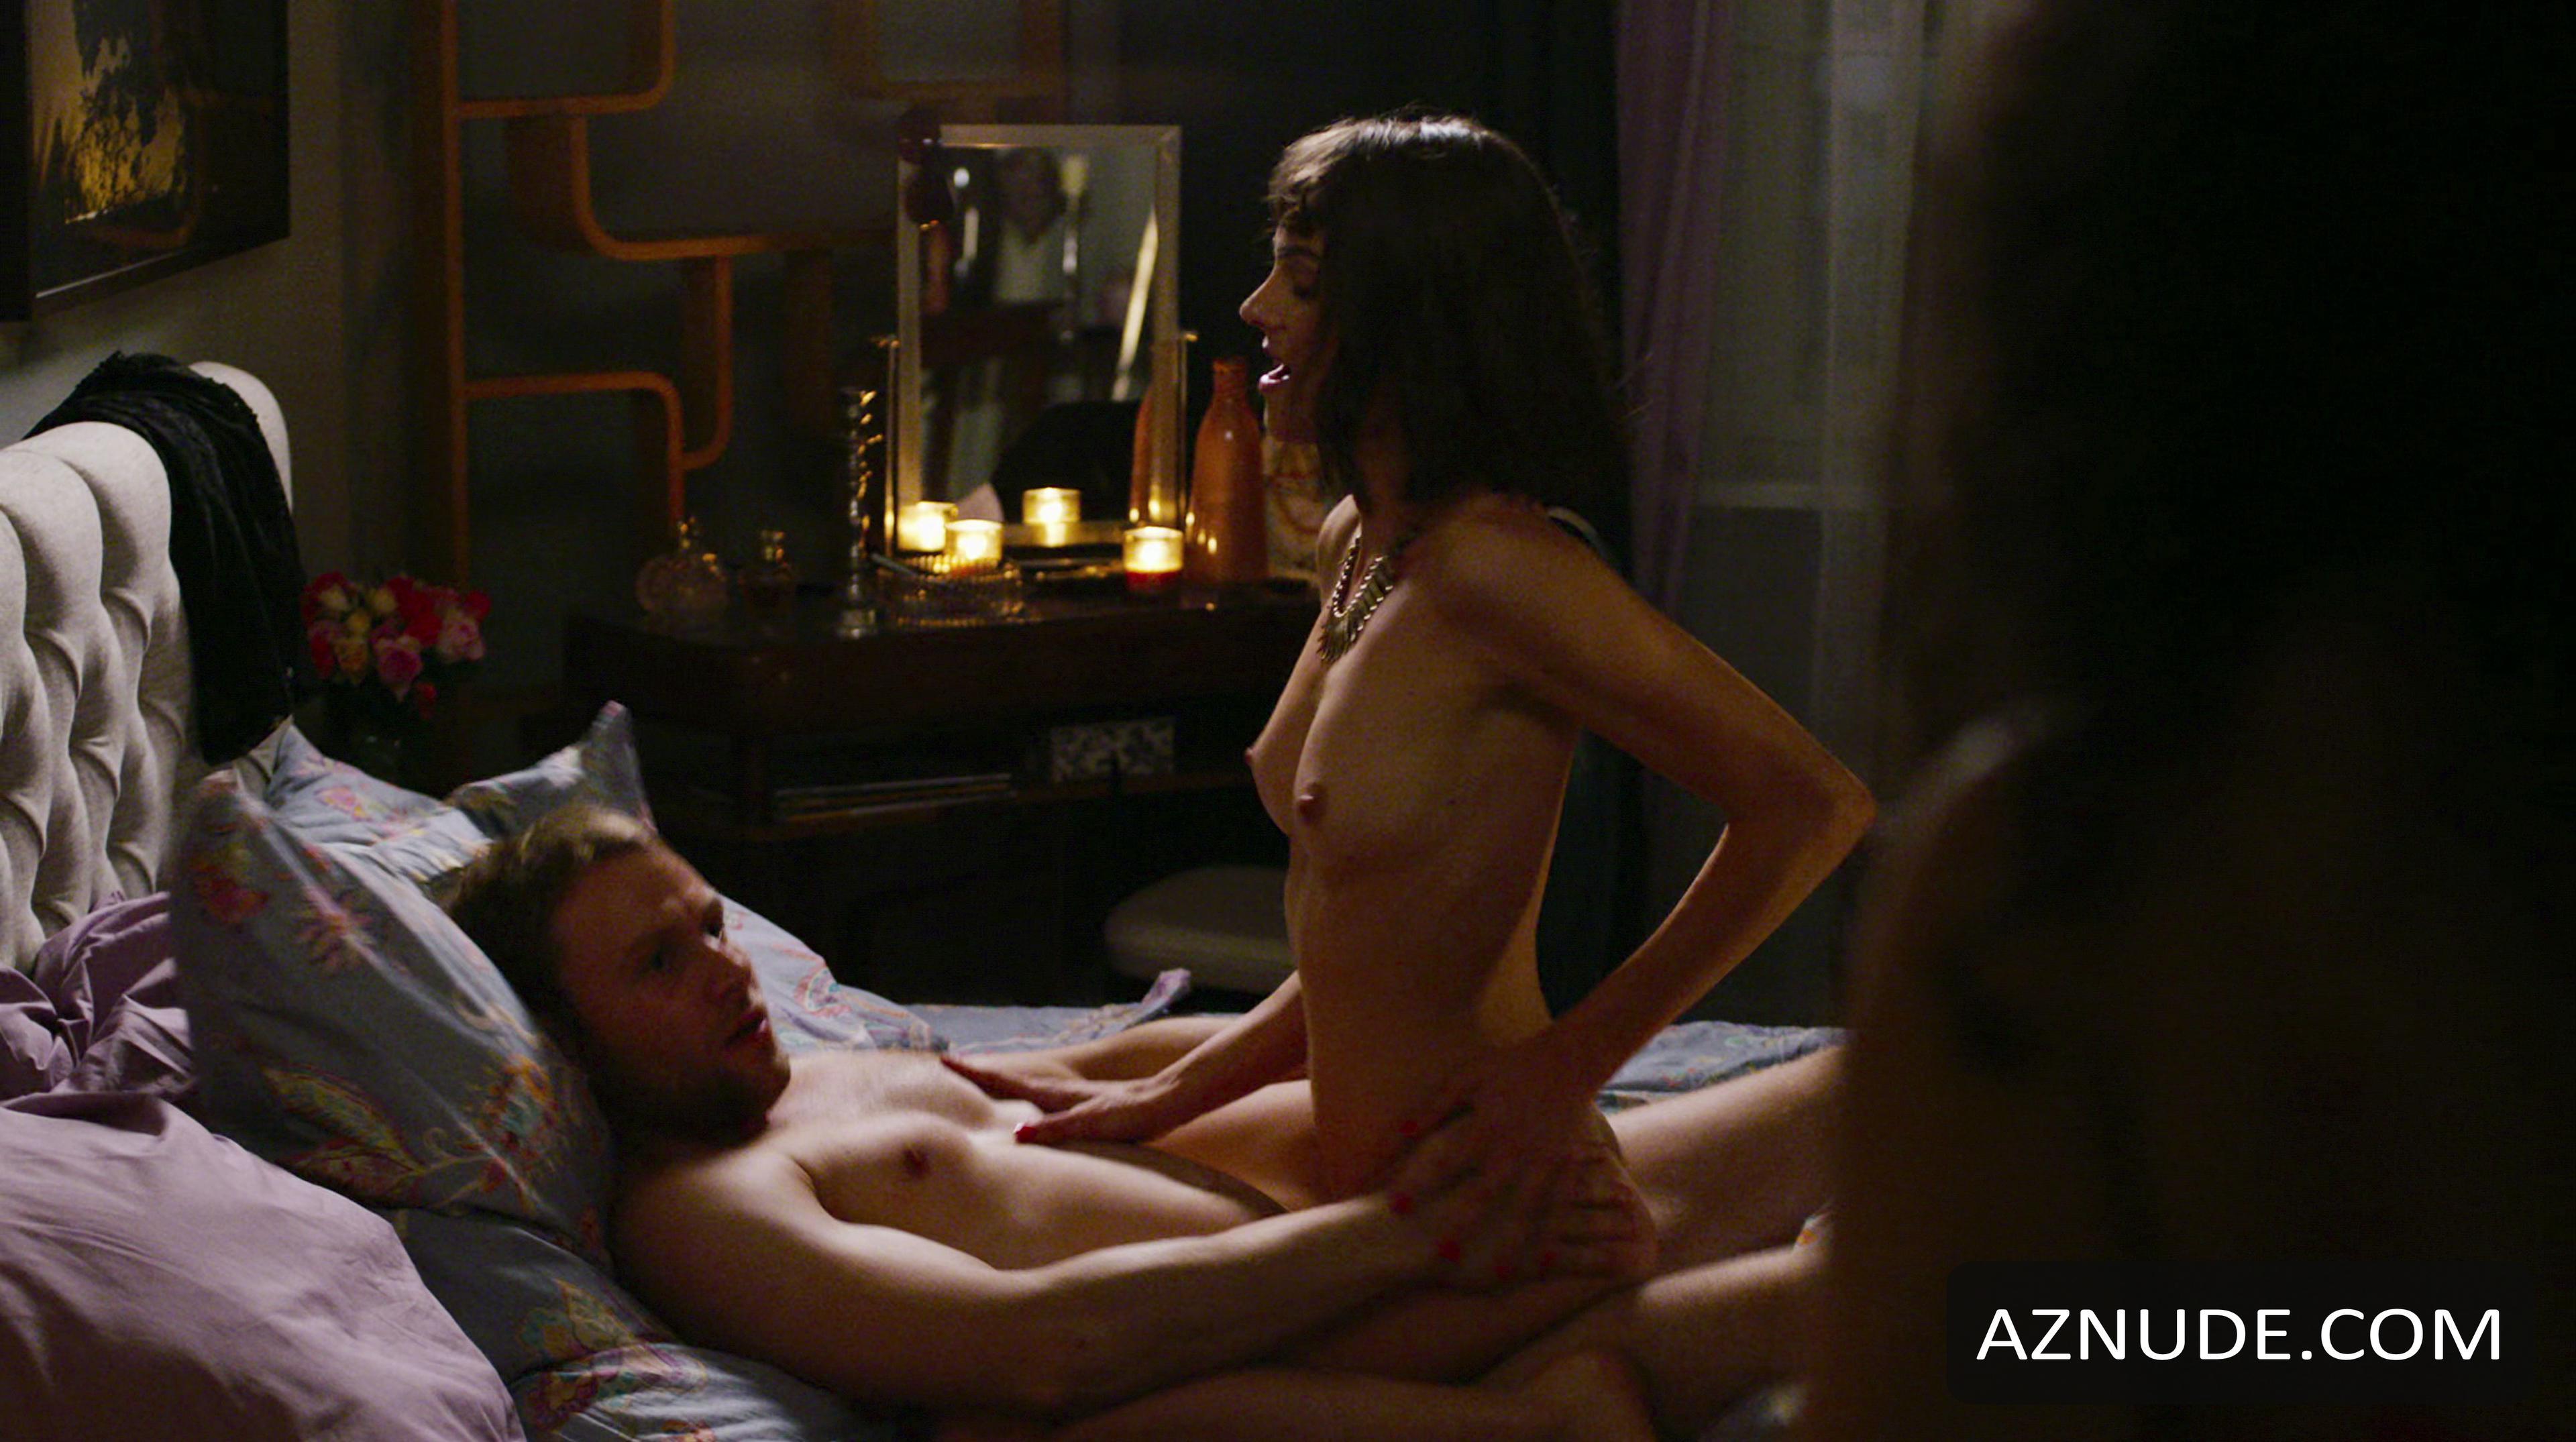 Alexandra daddario full frontal sex scene in true detective - 2 part 2